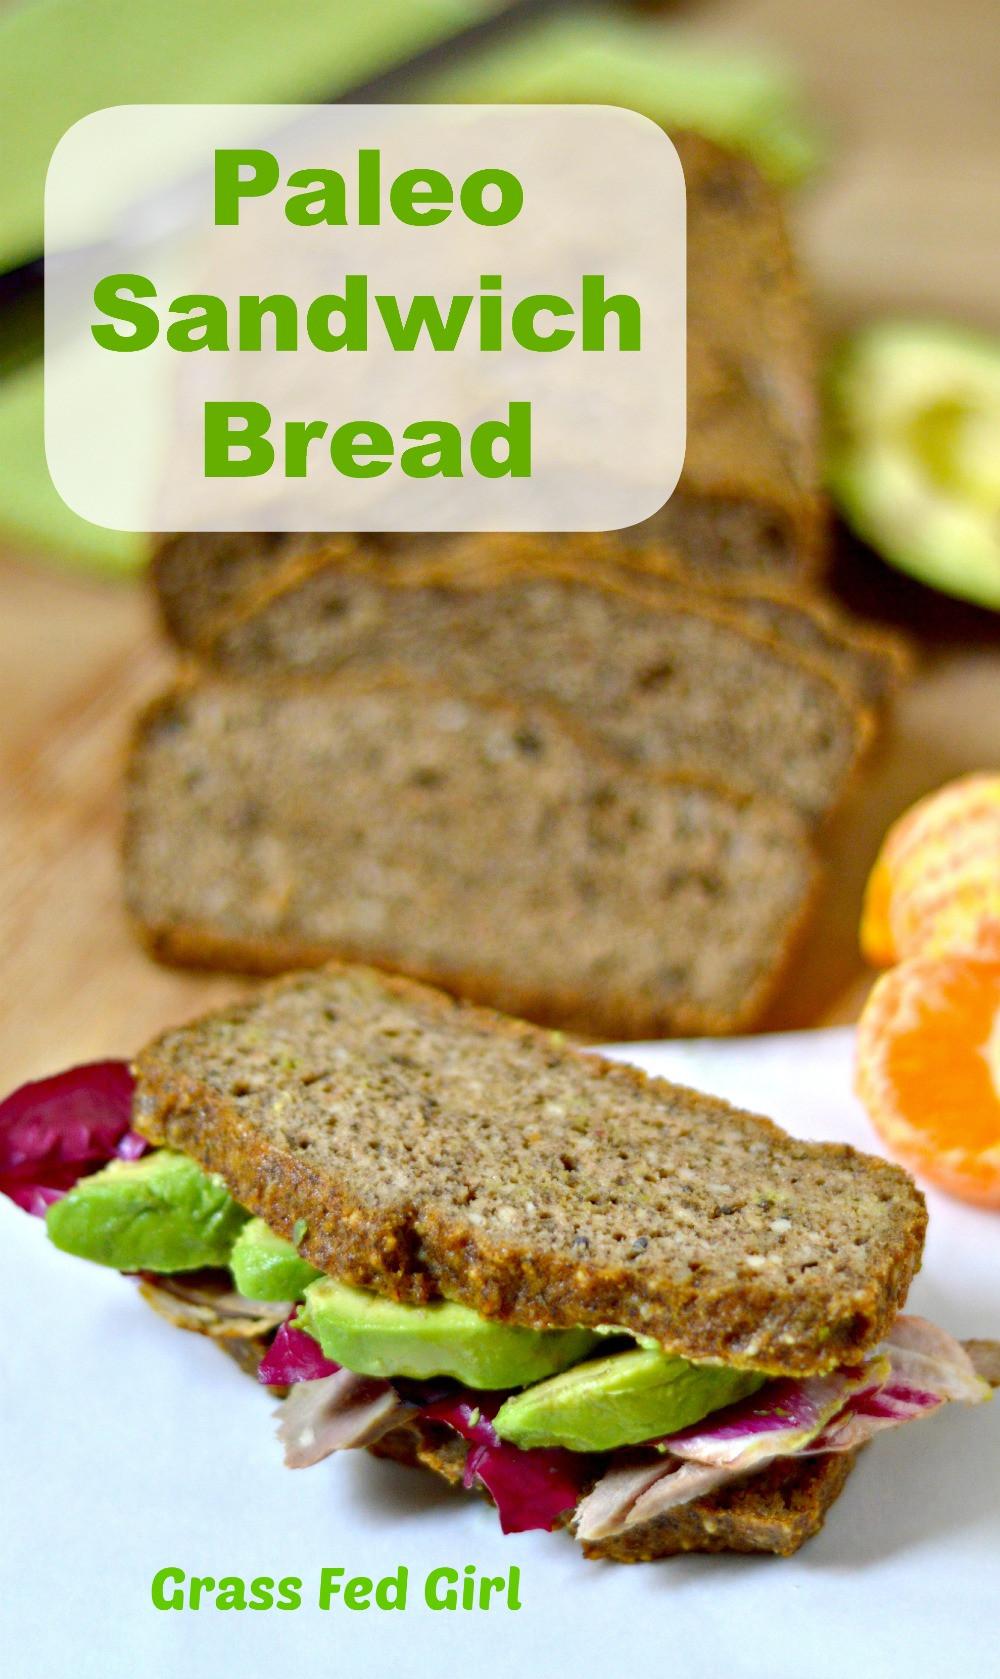 Keto Sandwich Bread Recipes  Keto Sandwich Bread Paleo Low Carb Grain Free & Gluten